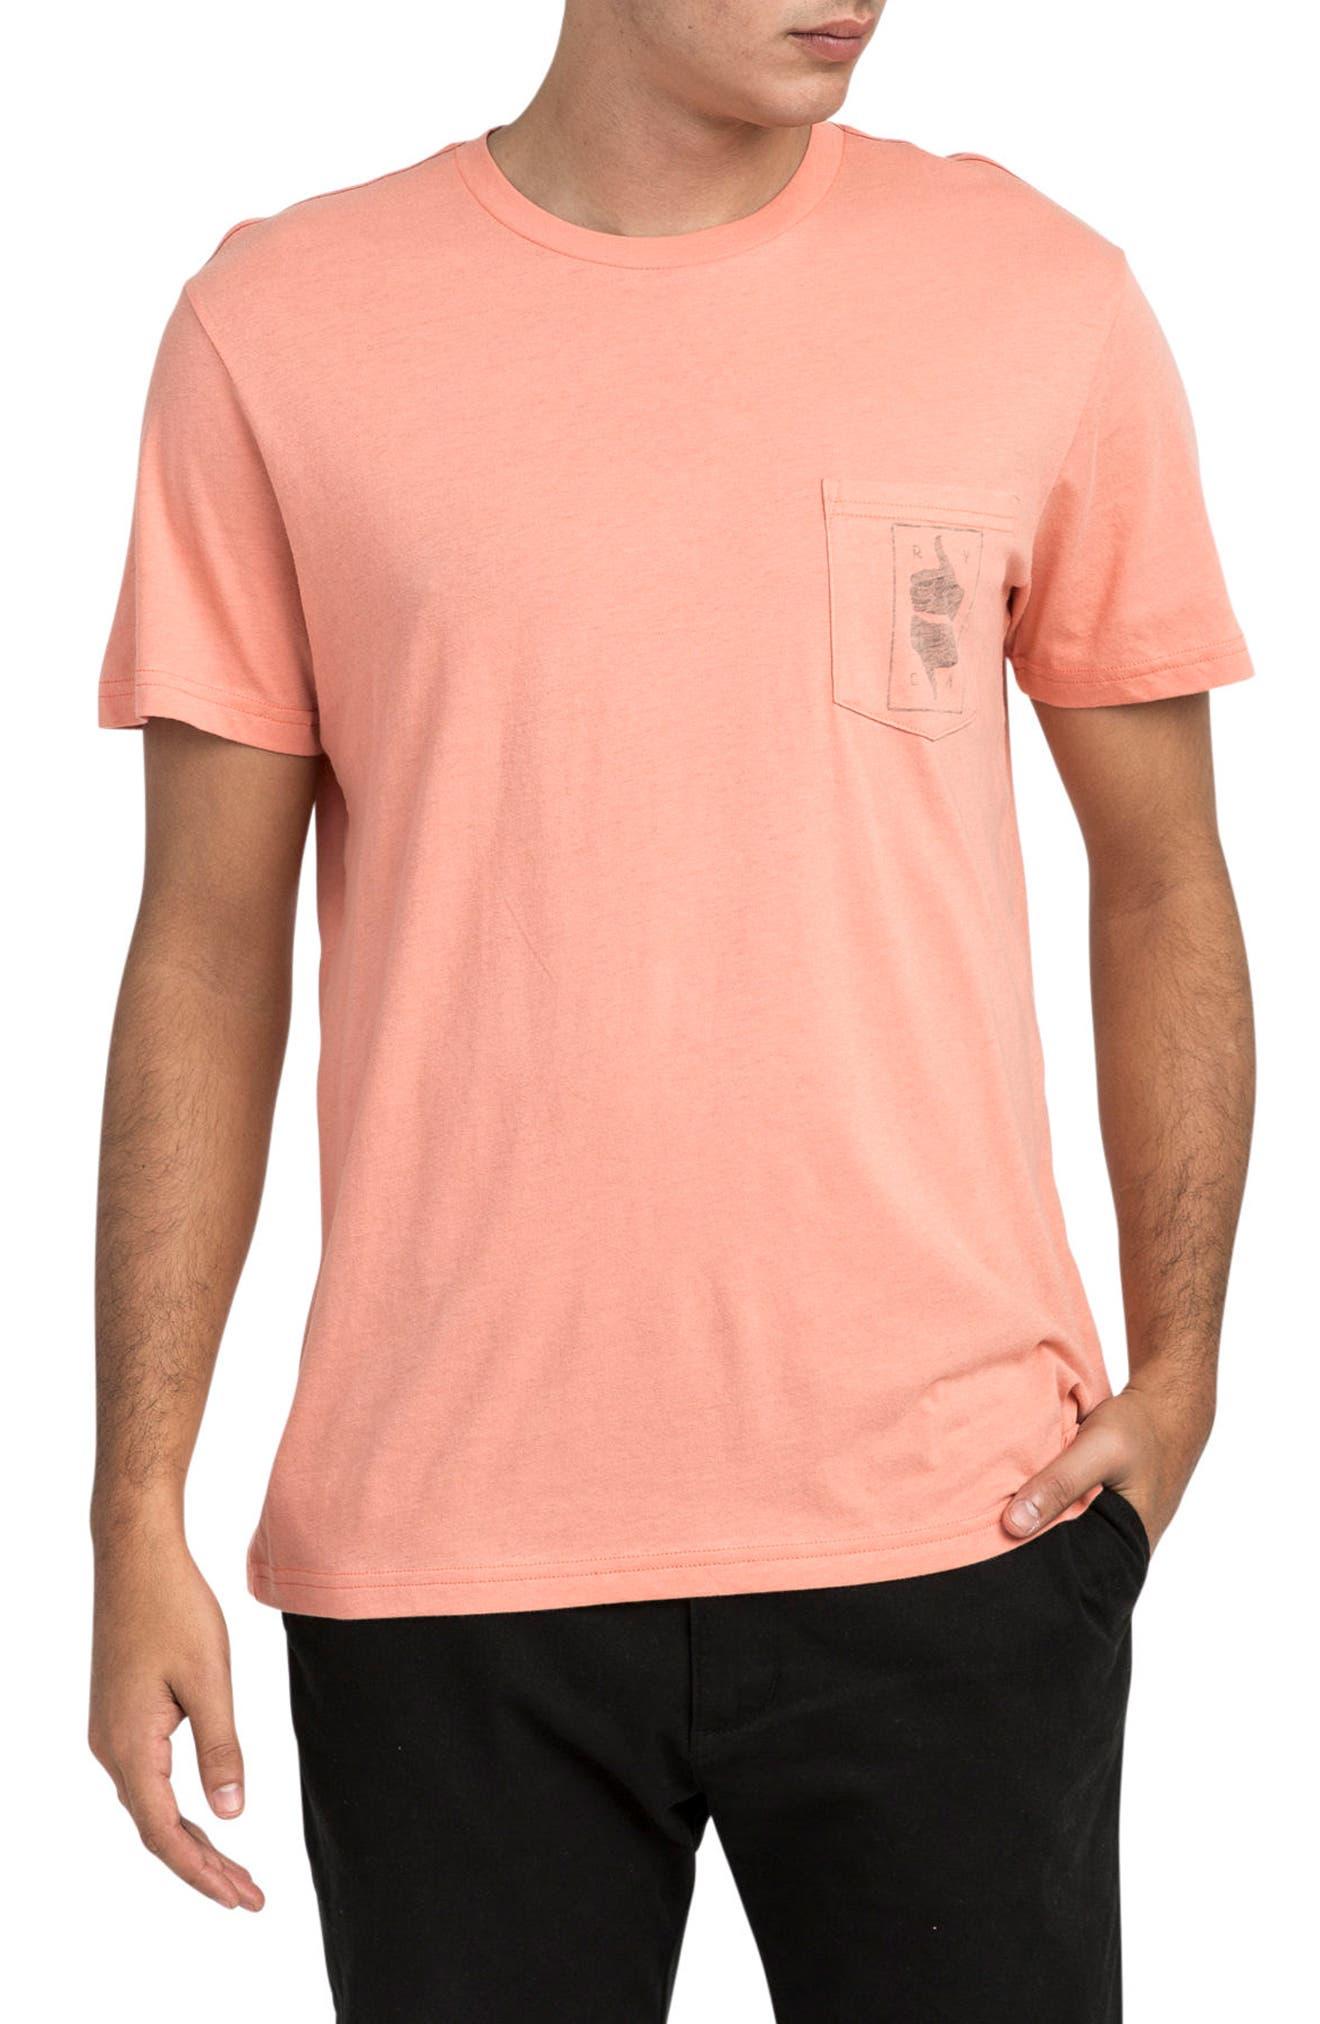 Thumbs Up T-Shirt,                         Main,                         color, 200